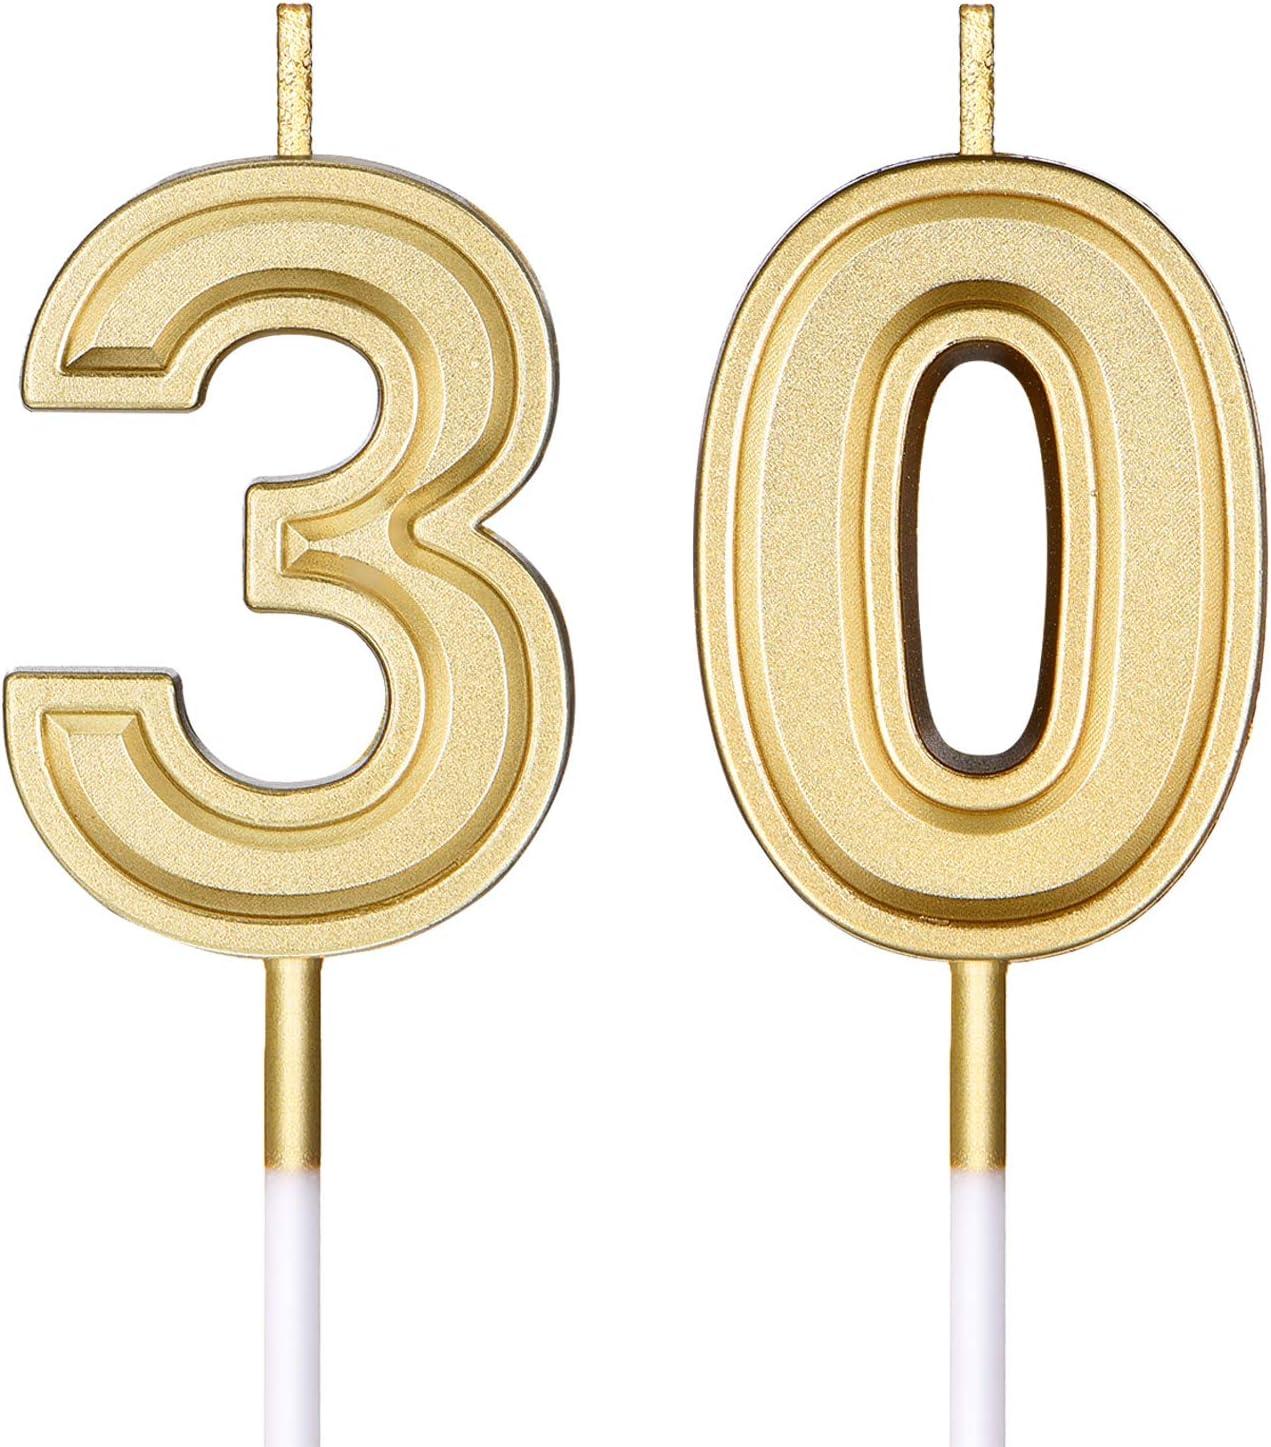 Frienda 30th 1 year warranty Birthday Candles Birthda Cake Numeral Happy Deluxe